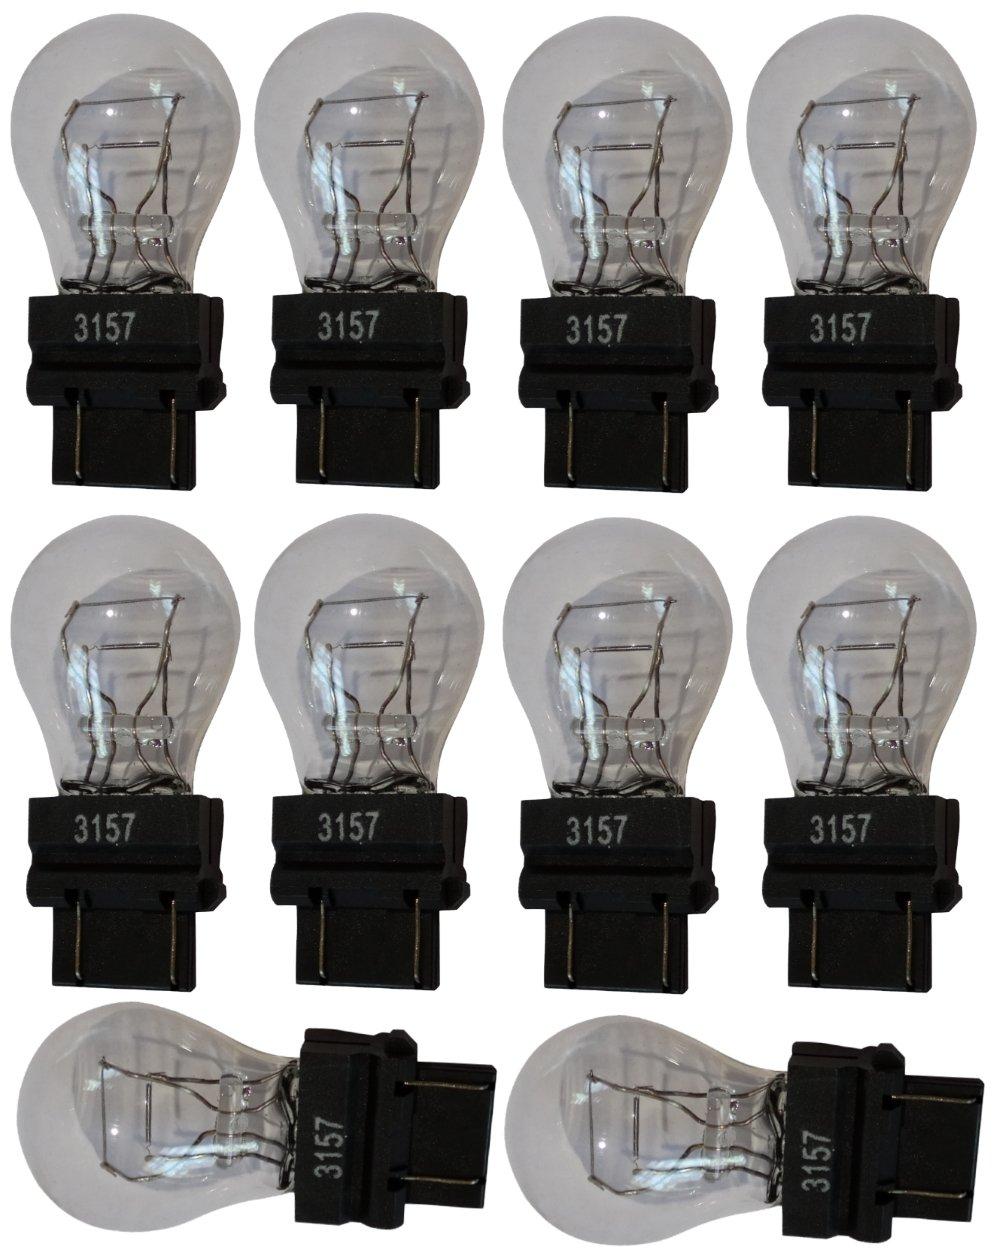 Aerzetix: 10x Ampoule 12V 3157 W2.5x16Q P27/7W SK2-C12034-AB6